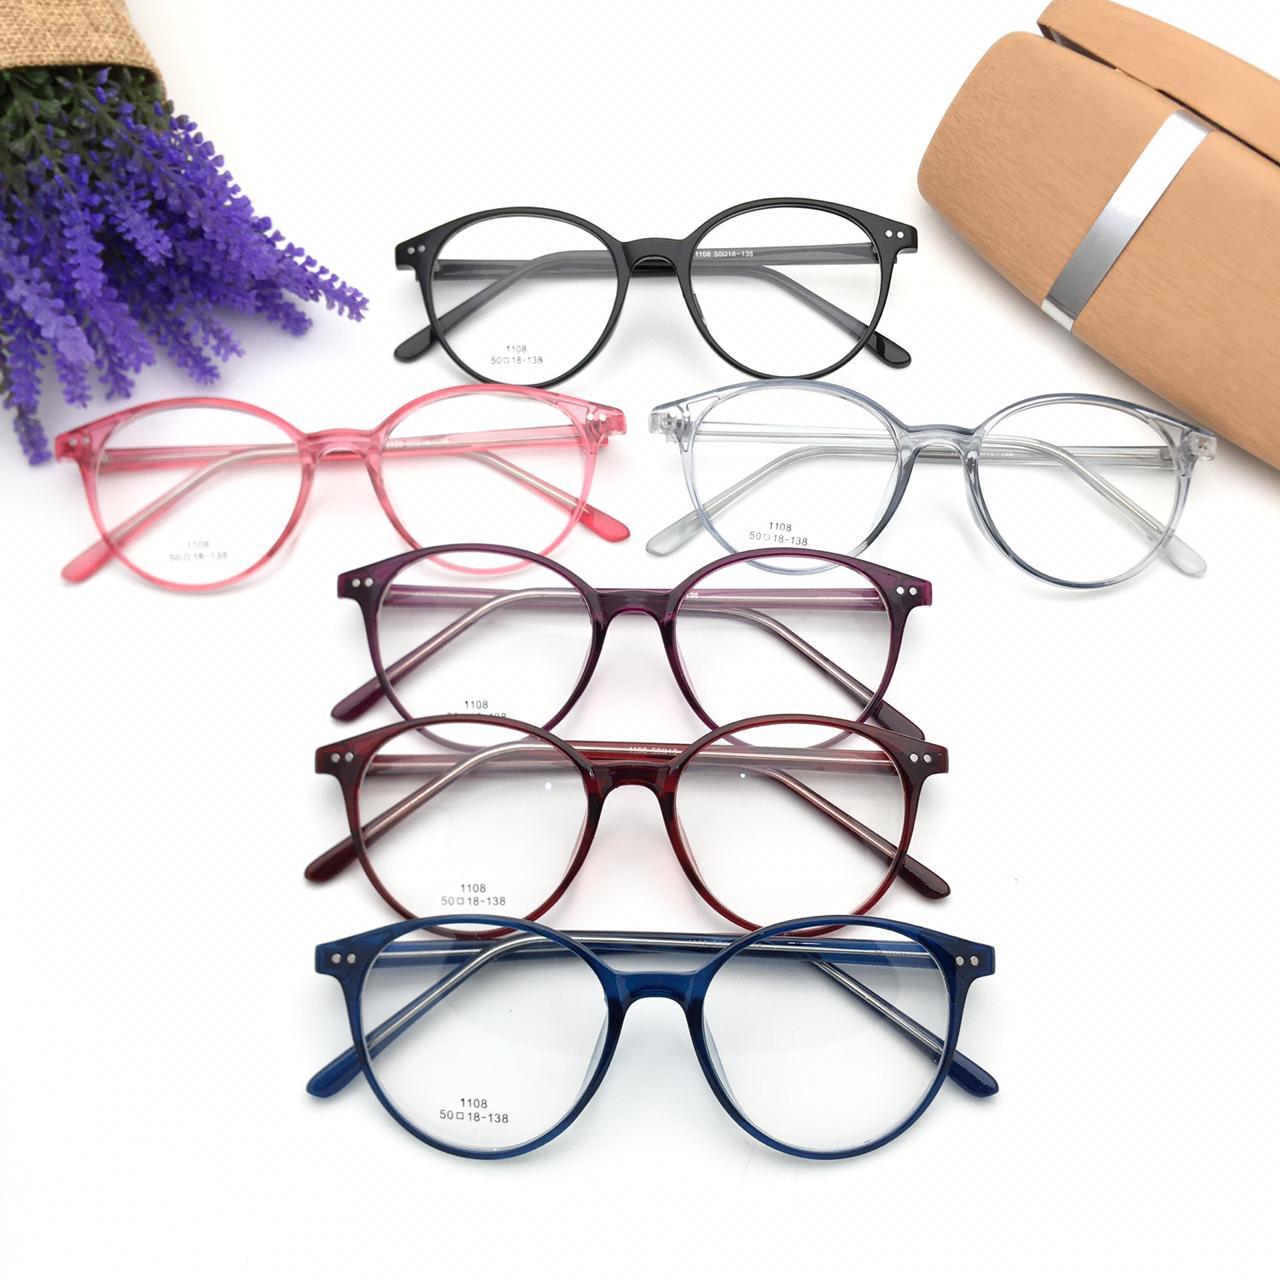 frame kacamata 03039 + lensa anti radiasi minus/plus/cylinder